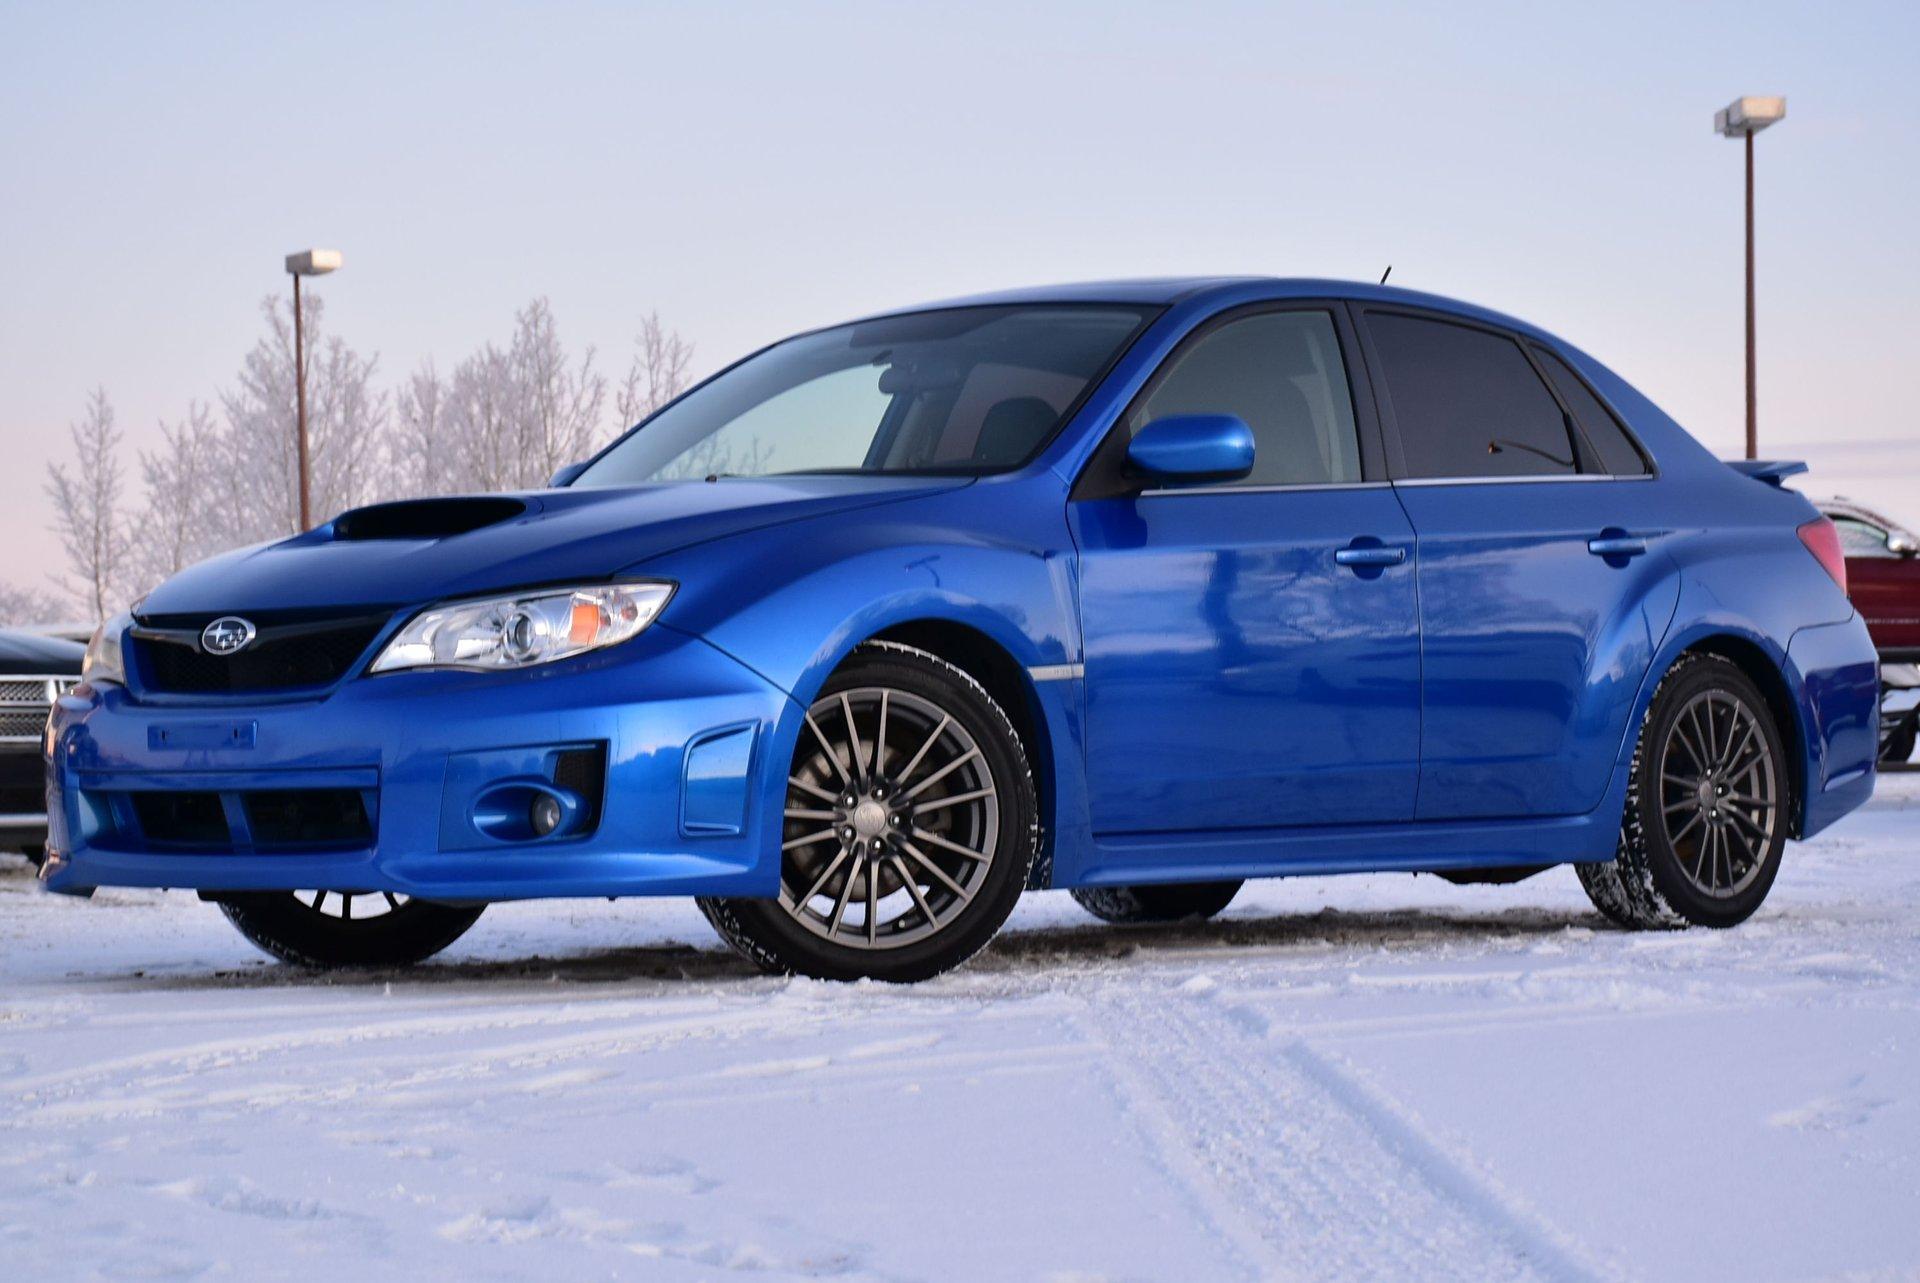 2012 subaru impreza sedan wrx w limited package